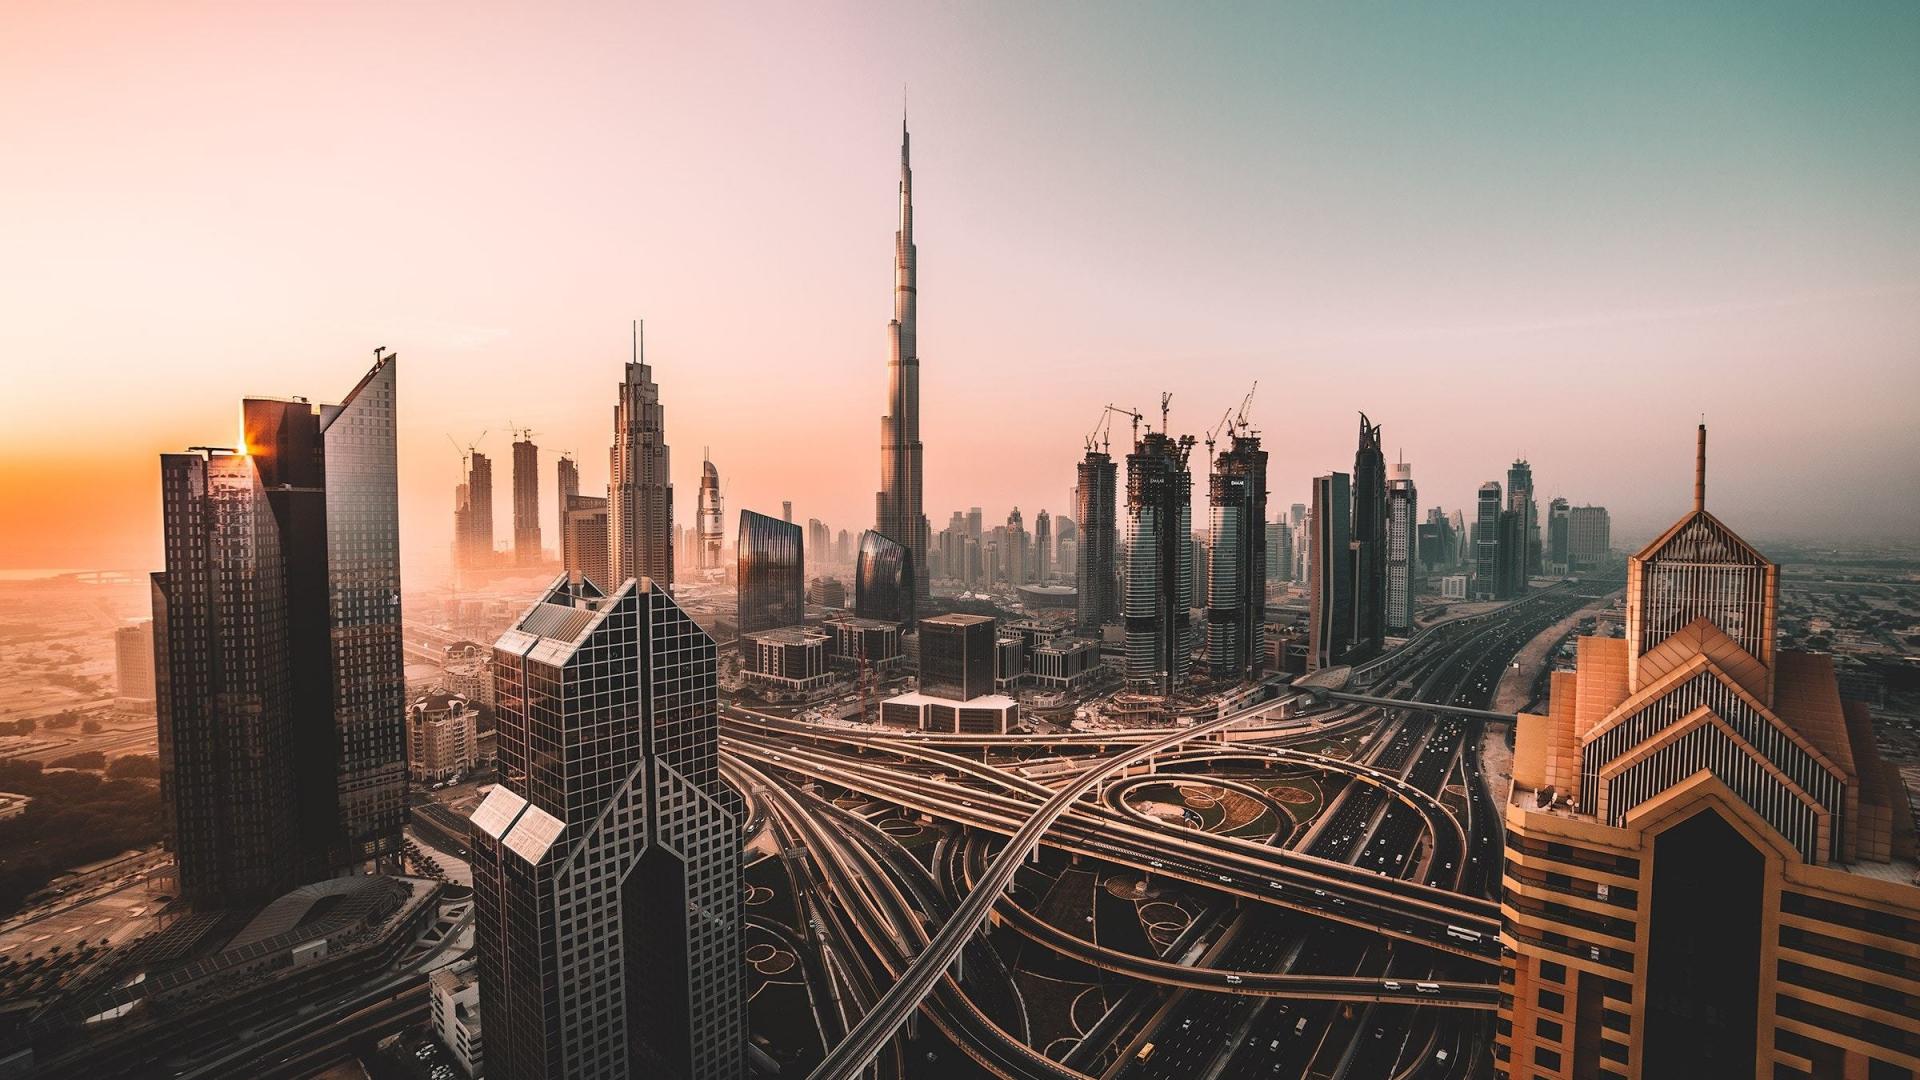 Dubai, skyline, cityscape, skyscrapers, buildings, Burj Khalifa, city, 1920x1080 wallpaper